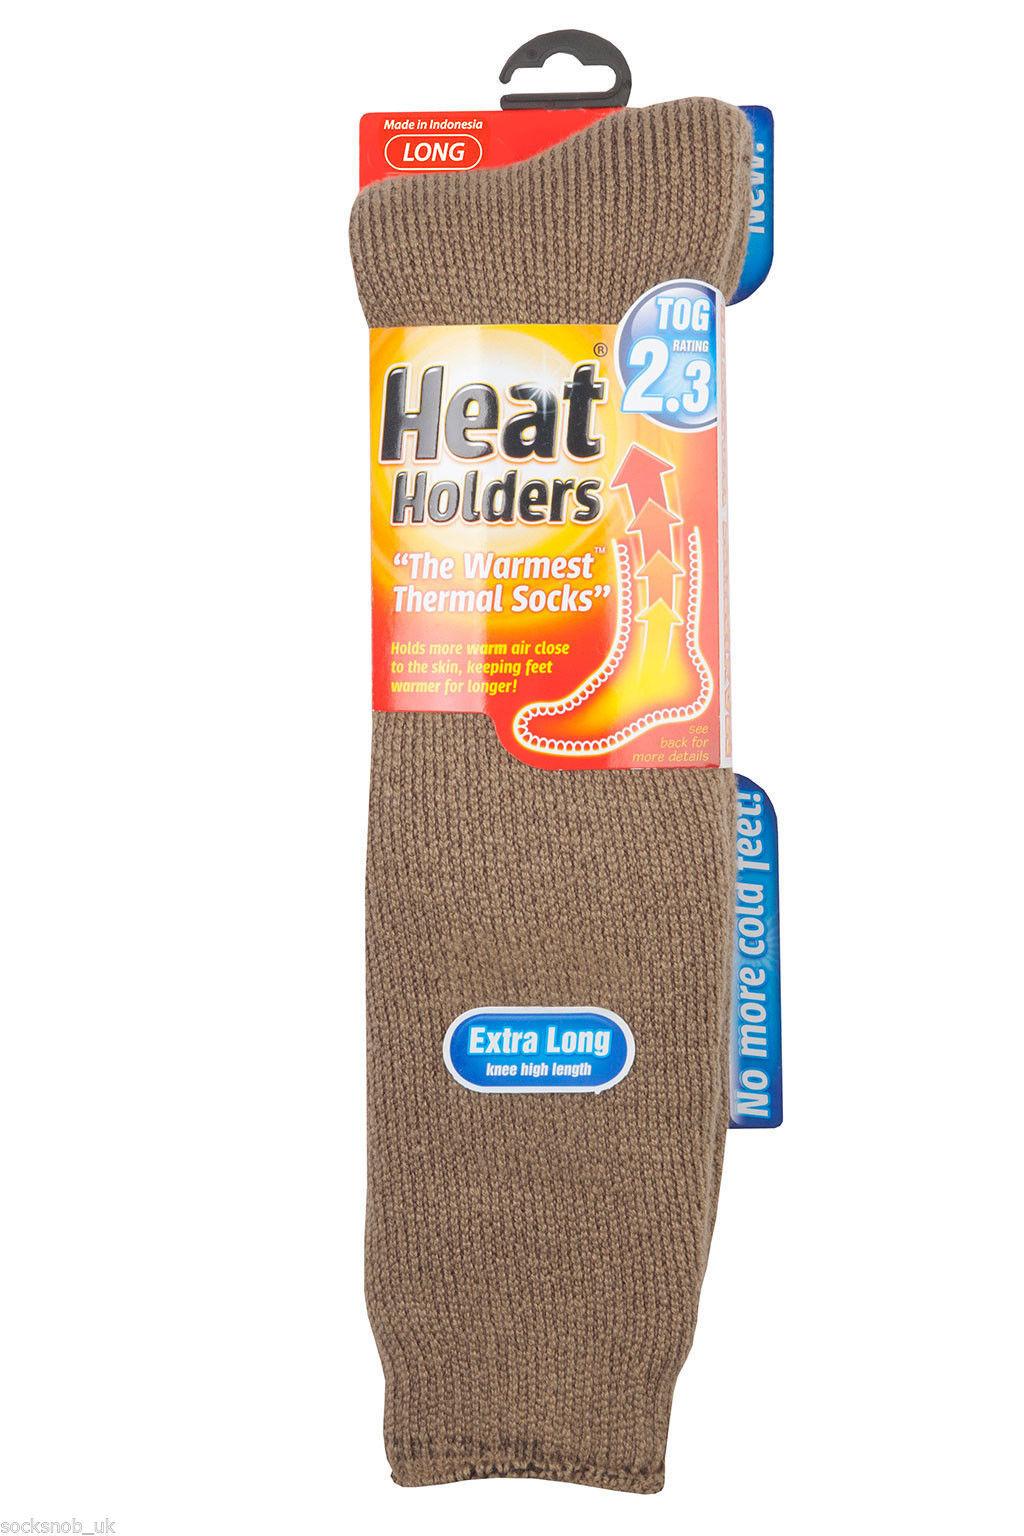 Heat Holders - Mens Thermal Long Socks All Colours 6-11 uk, 39-45 eur,7-12 us - $19.99